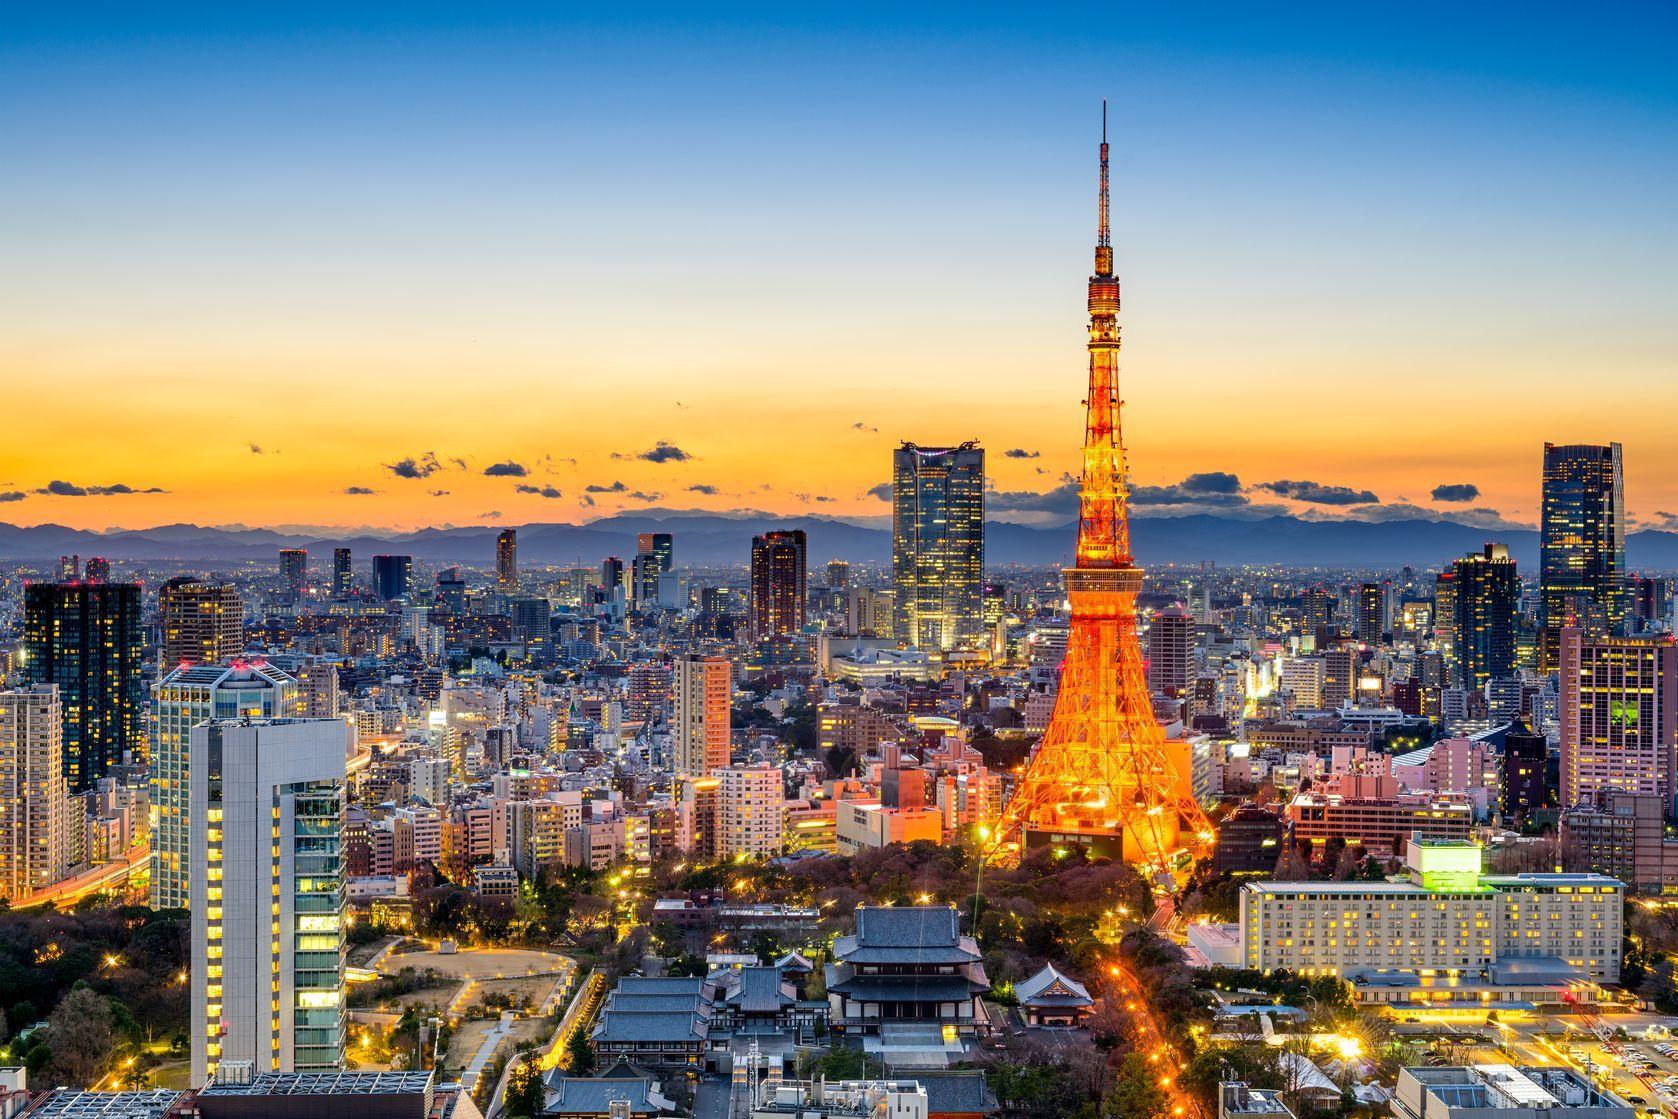 Noční panorama Tokia v Japonsku   sepavo/123RF.com